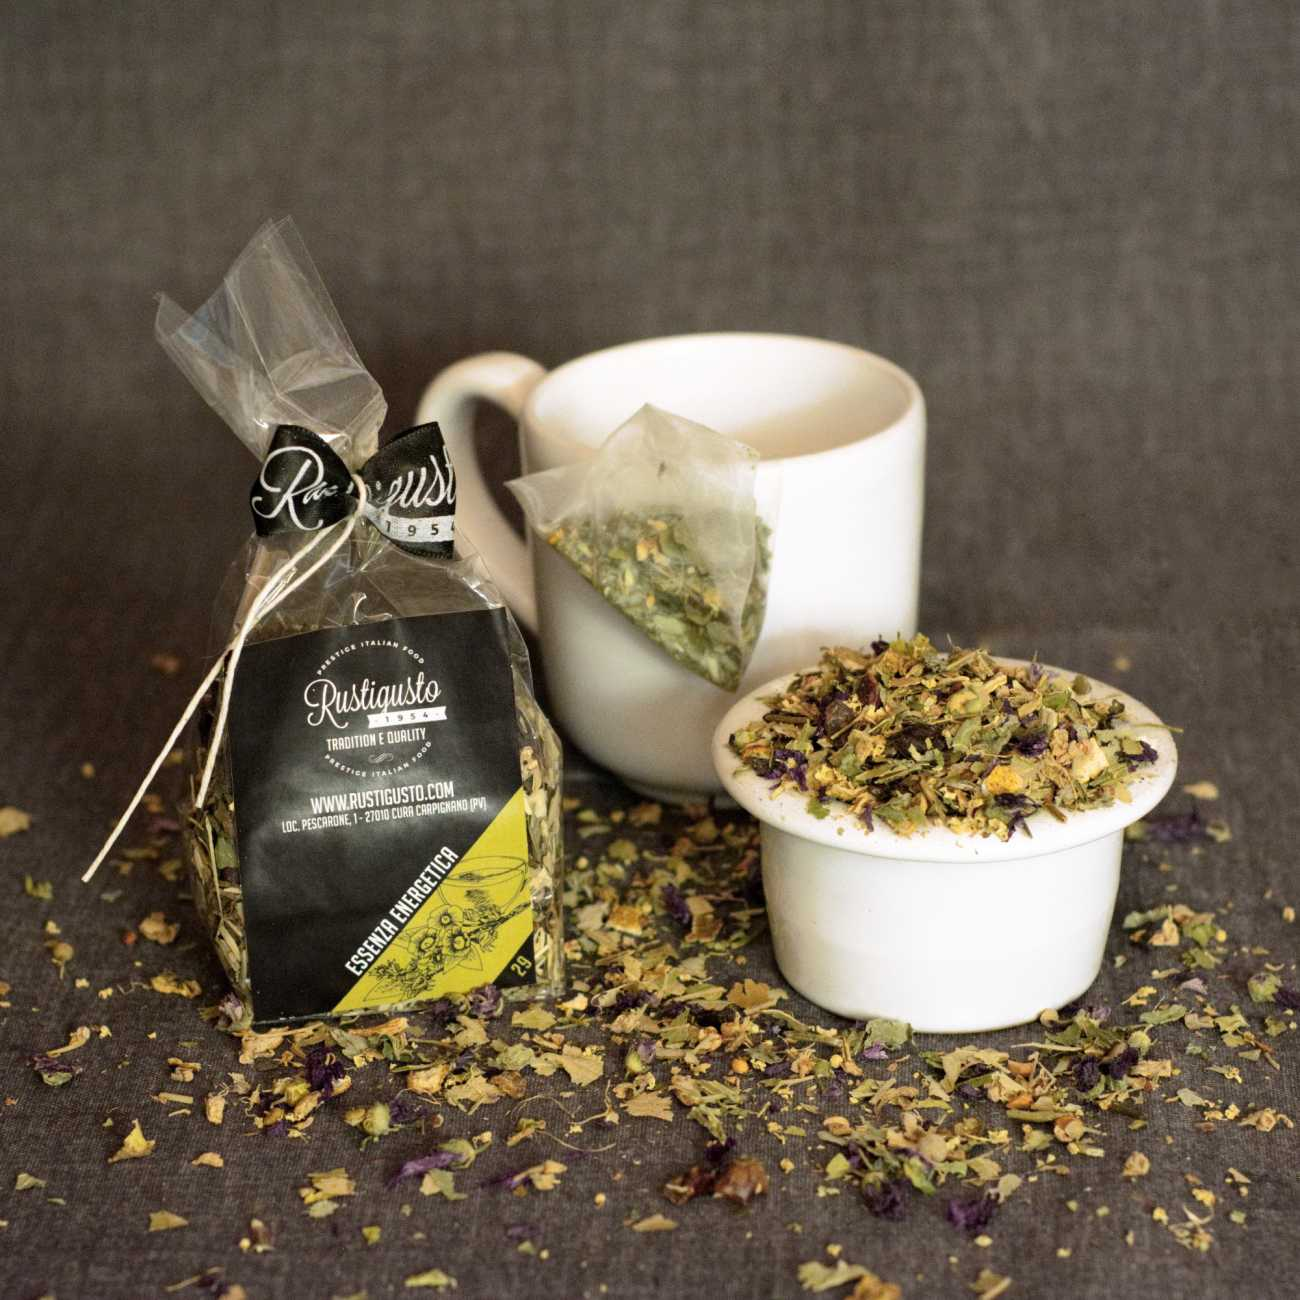 Energy herb tea - Coffee and herbal teas